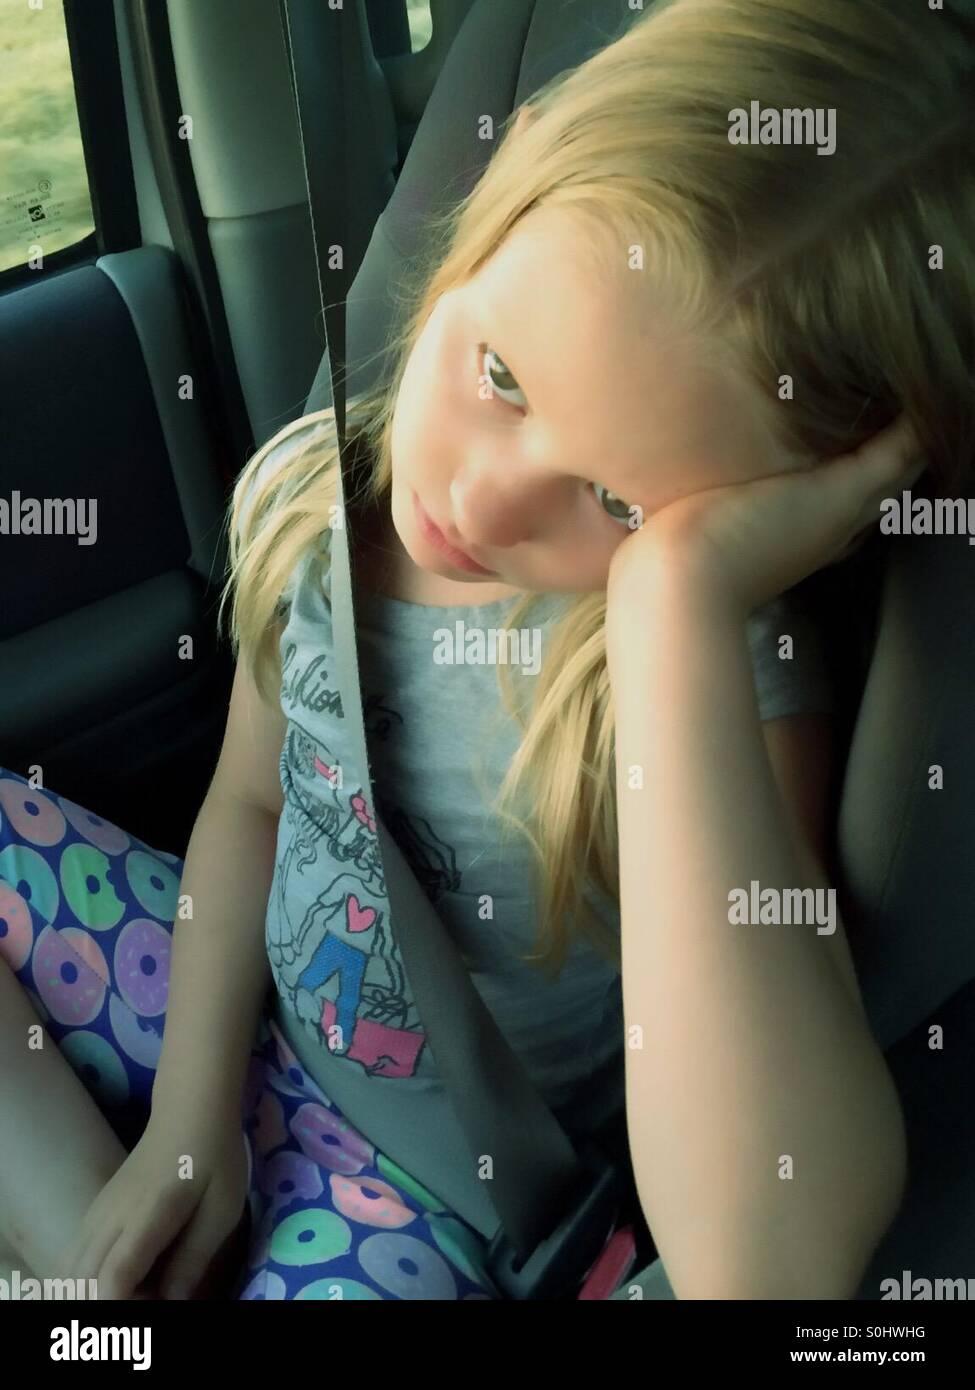 Aburridos y cansados chica sentada en un coche Imagen De Stock